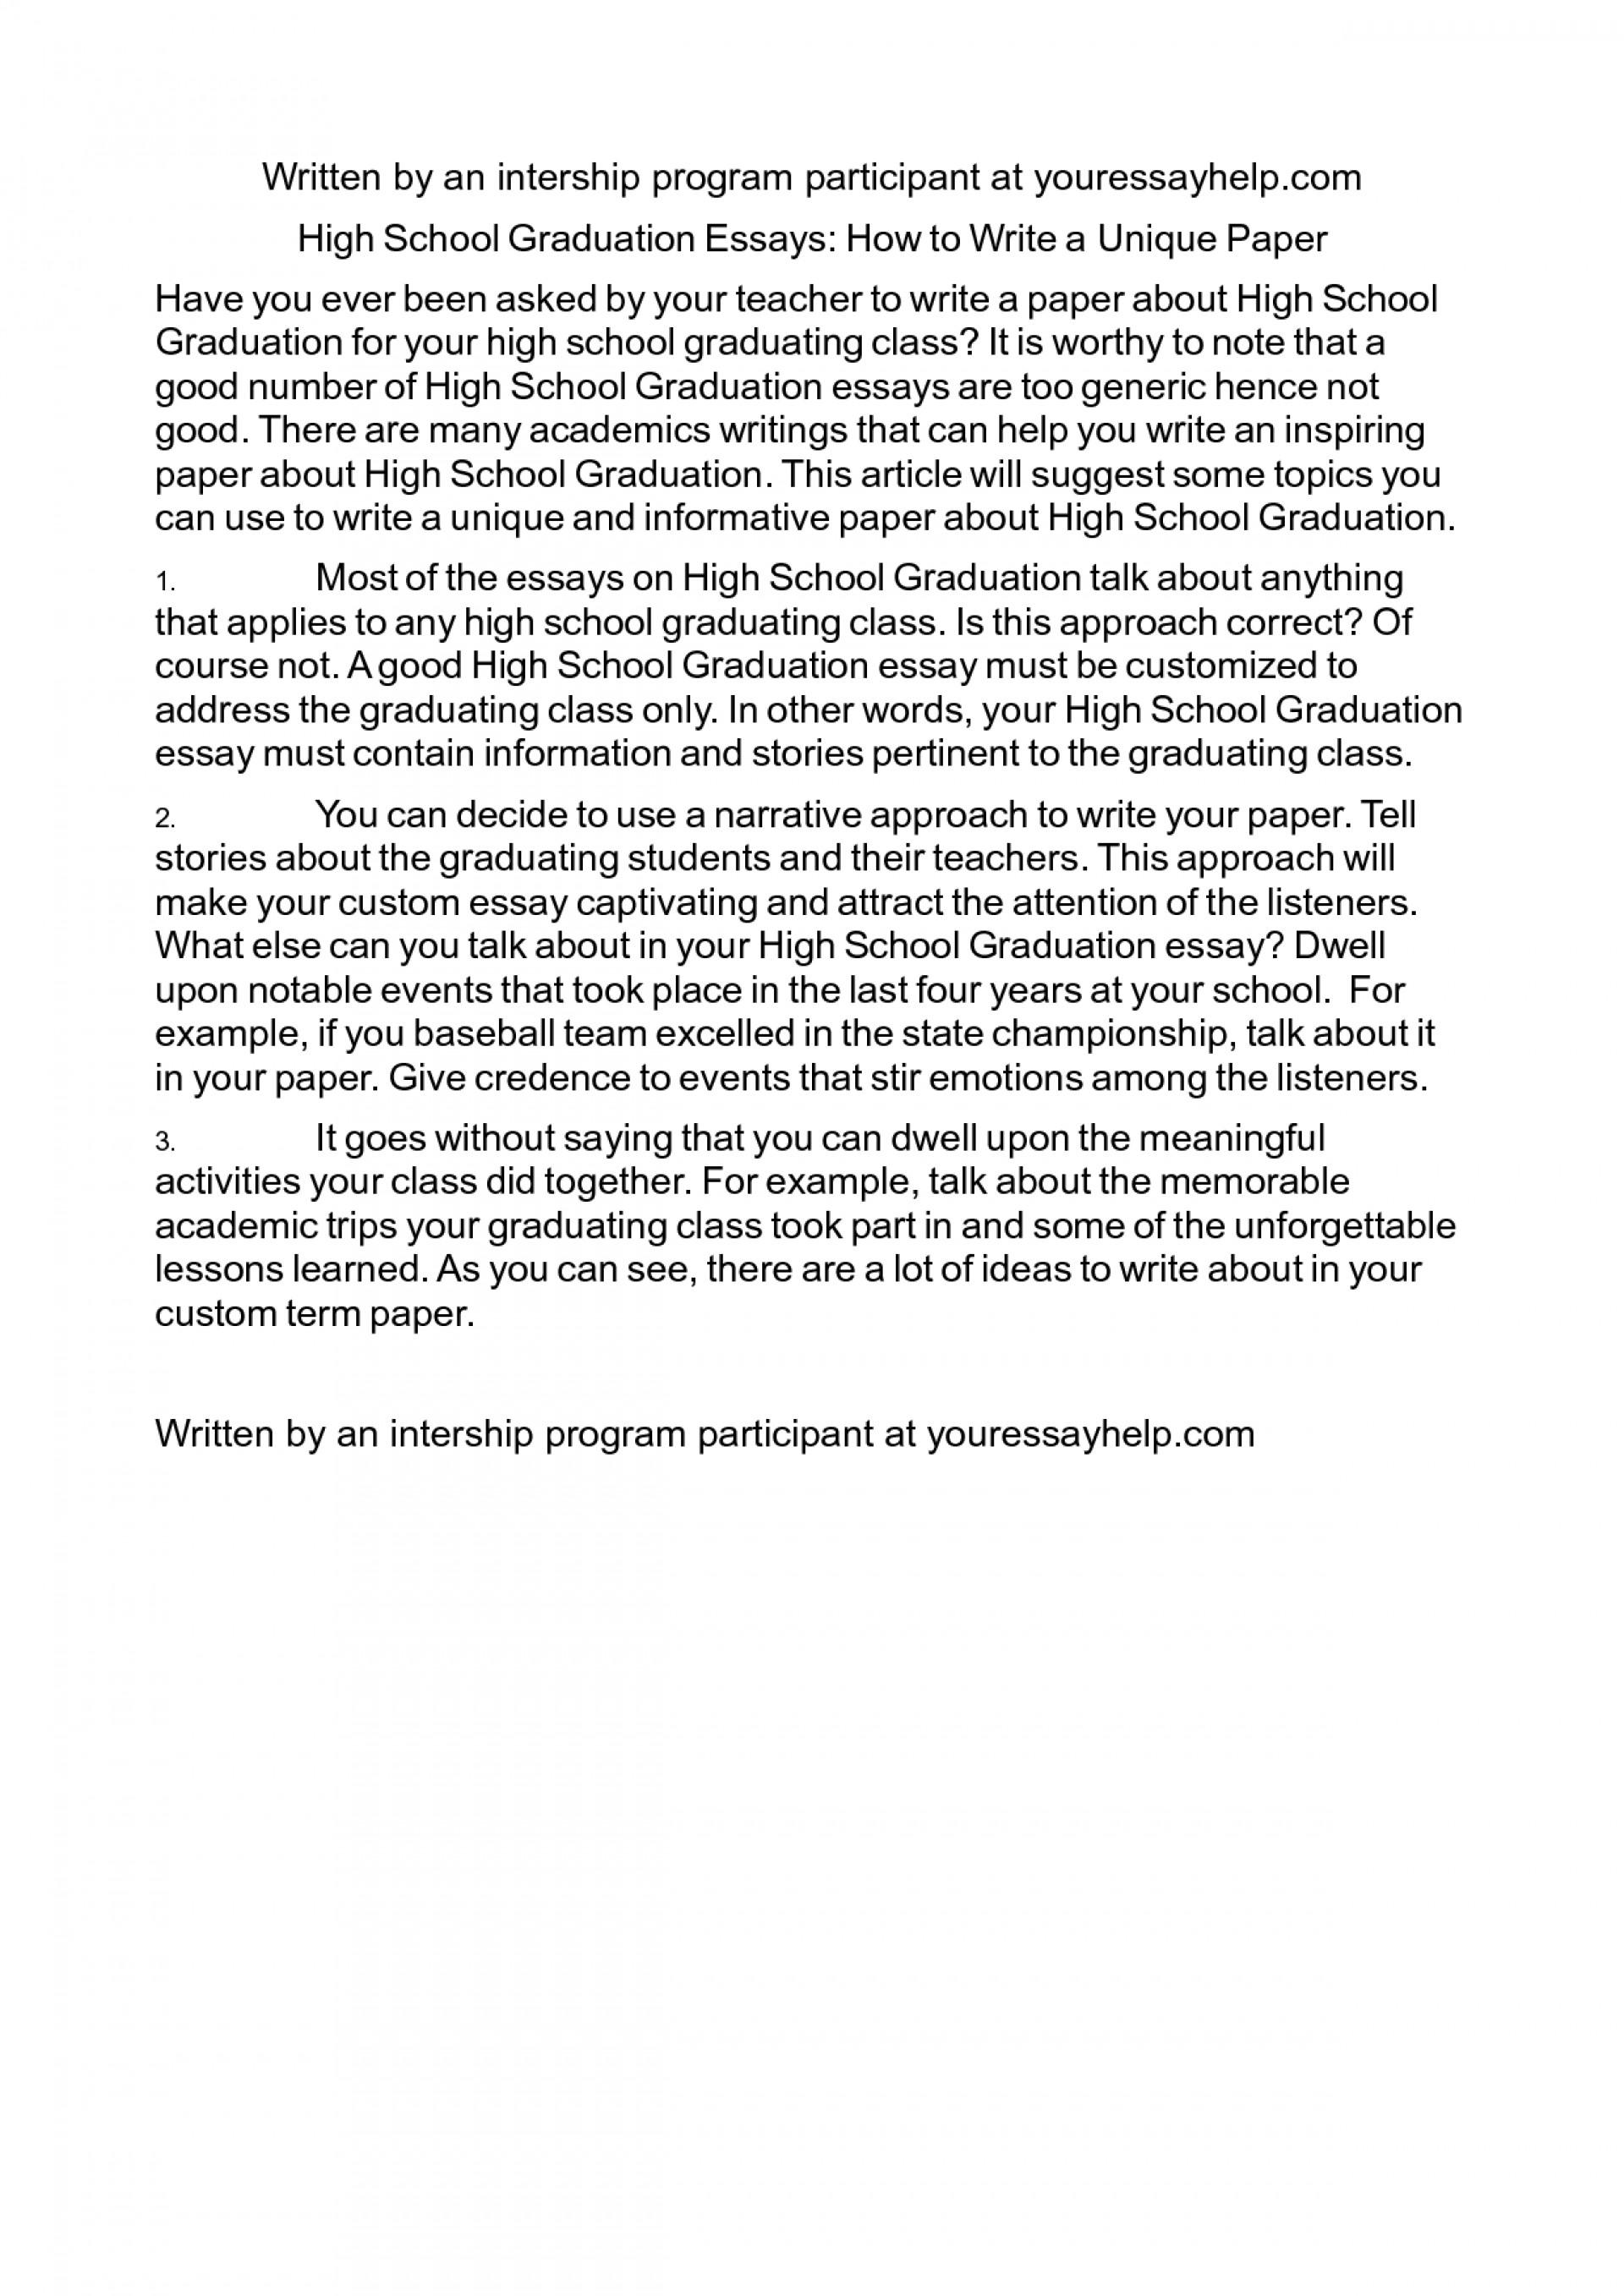 004 Essay Example Graduation Examples Cvdzudn Day 5th Grade Elementary Project Topics Sample High Rare School Ceremony 1920